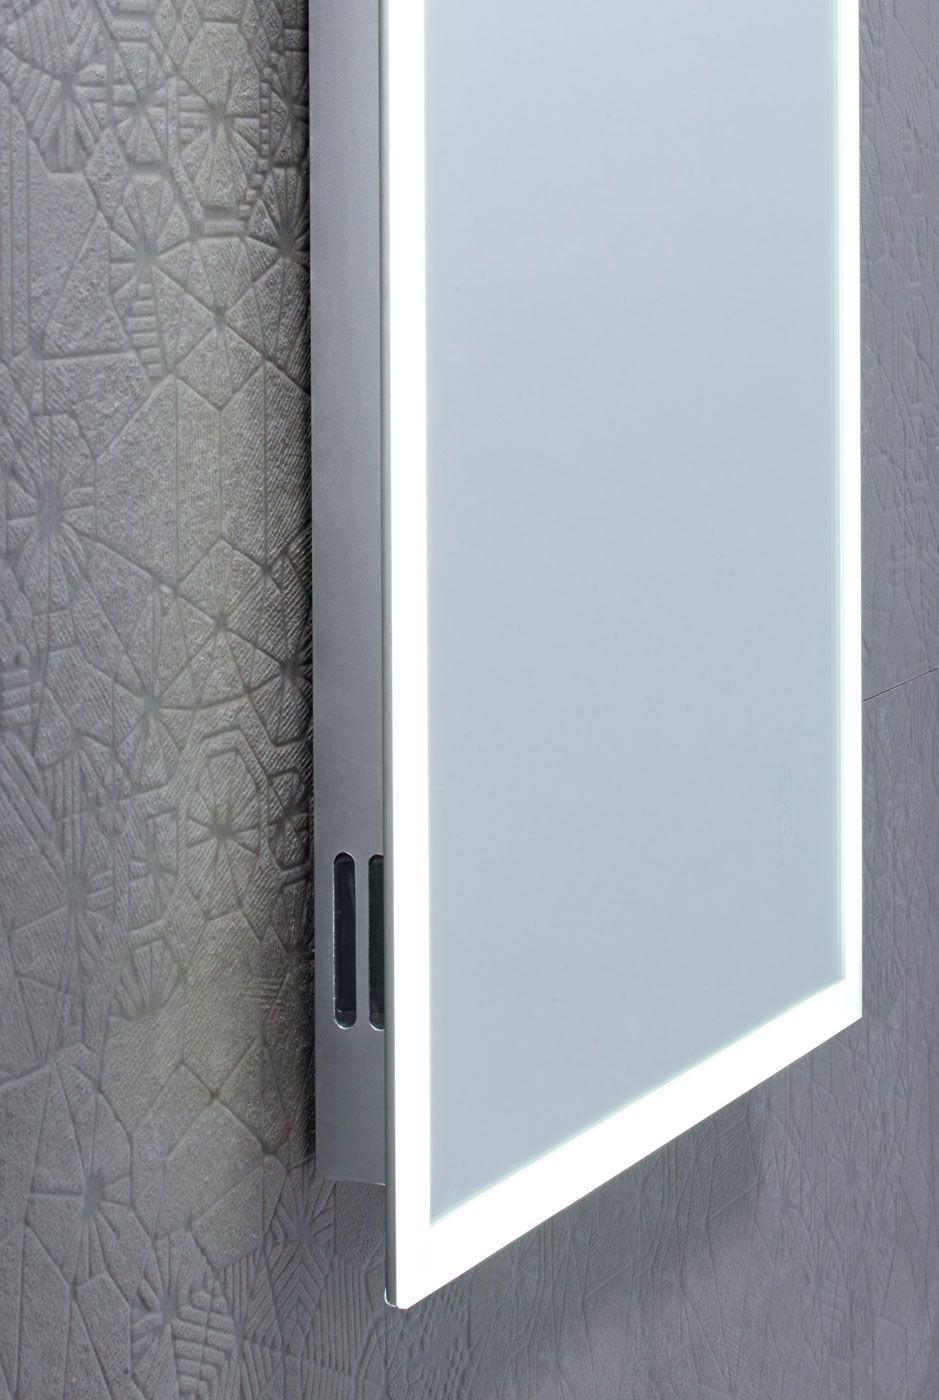 Buy Roper Rhodes Forte Illuminated Bluetooth Bathroom Mirror